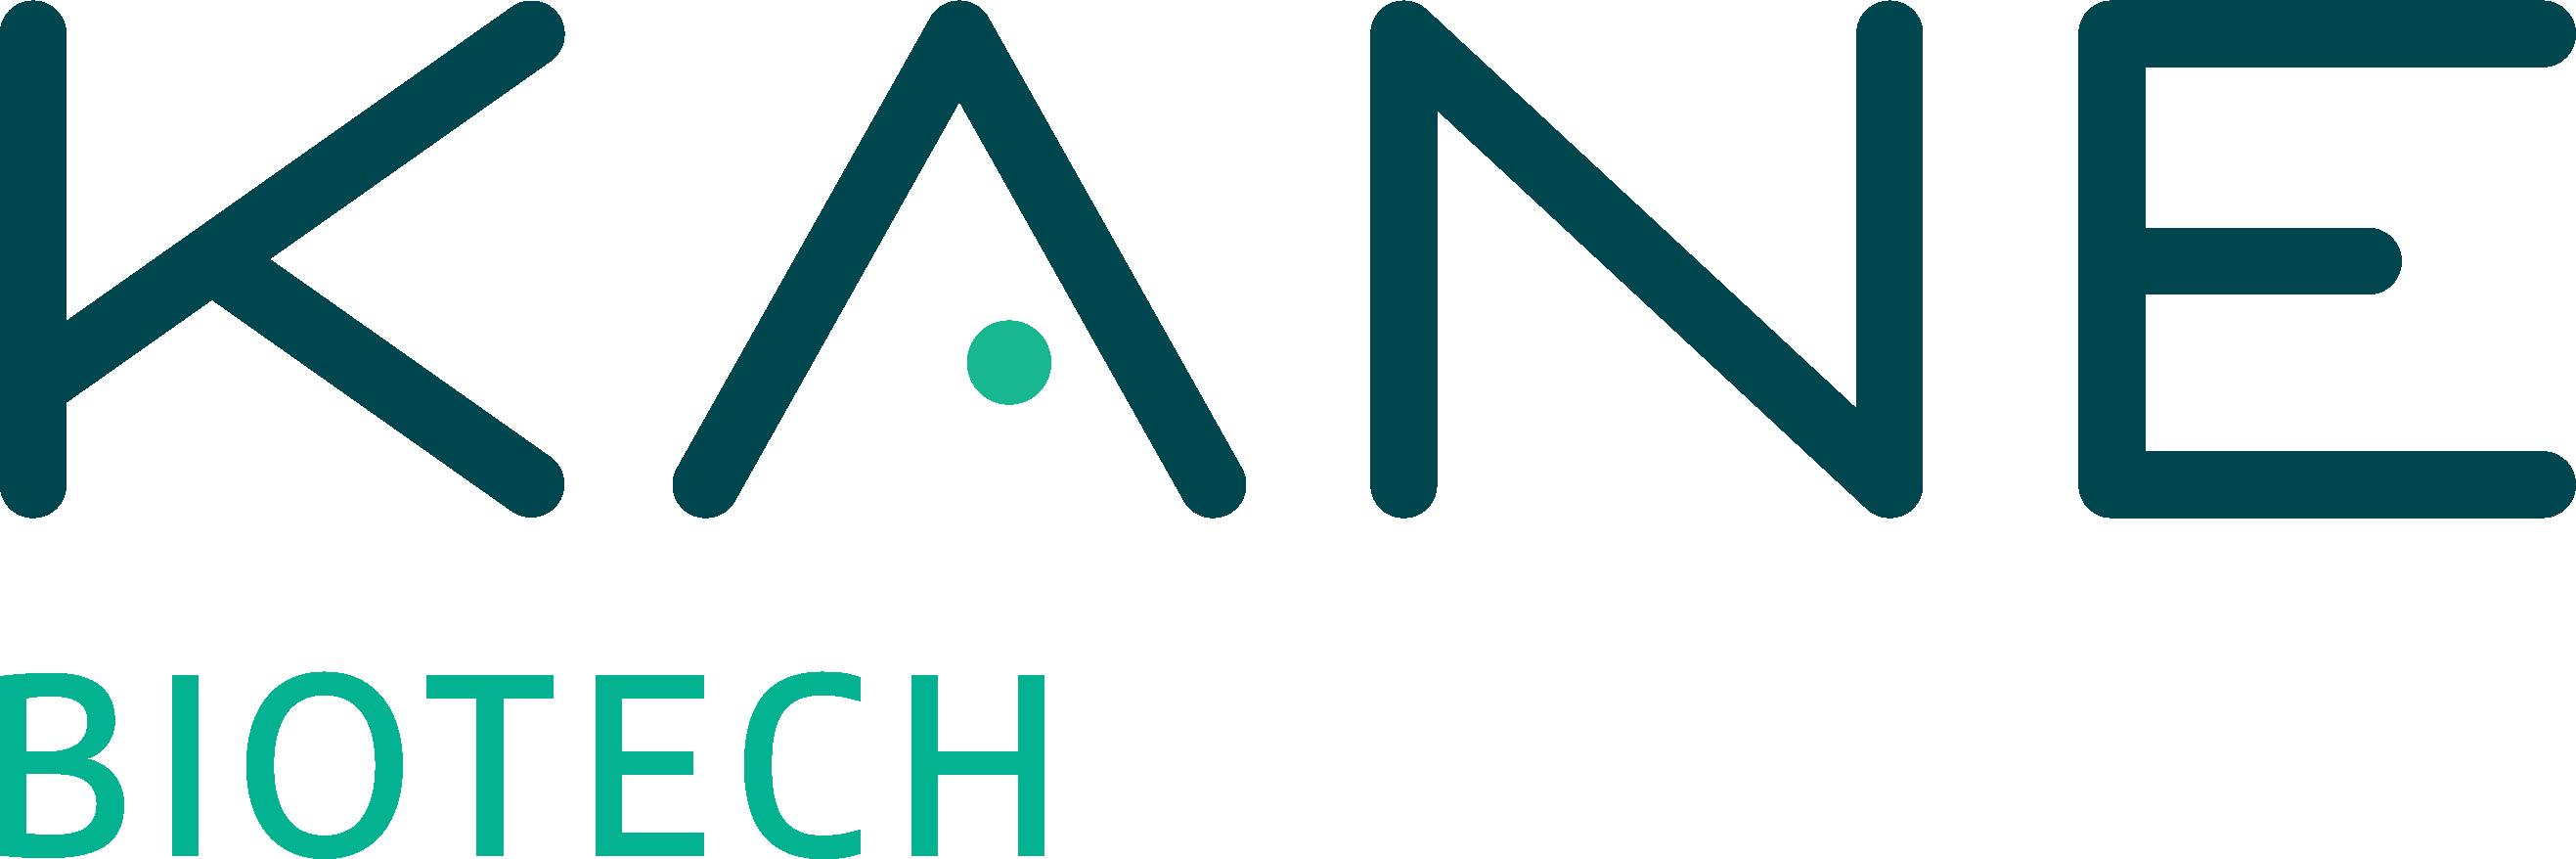 Kane Biotech Appoints New Advisor